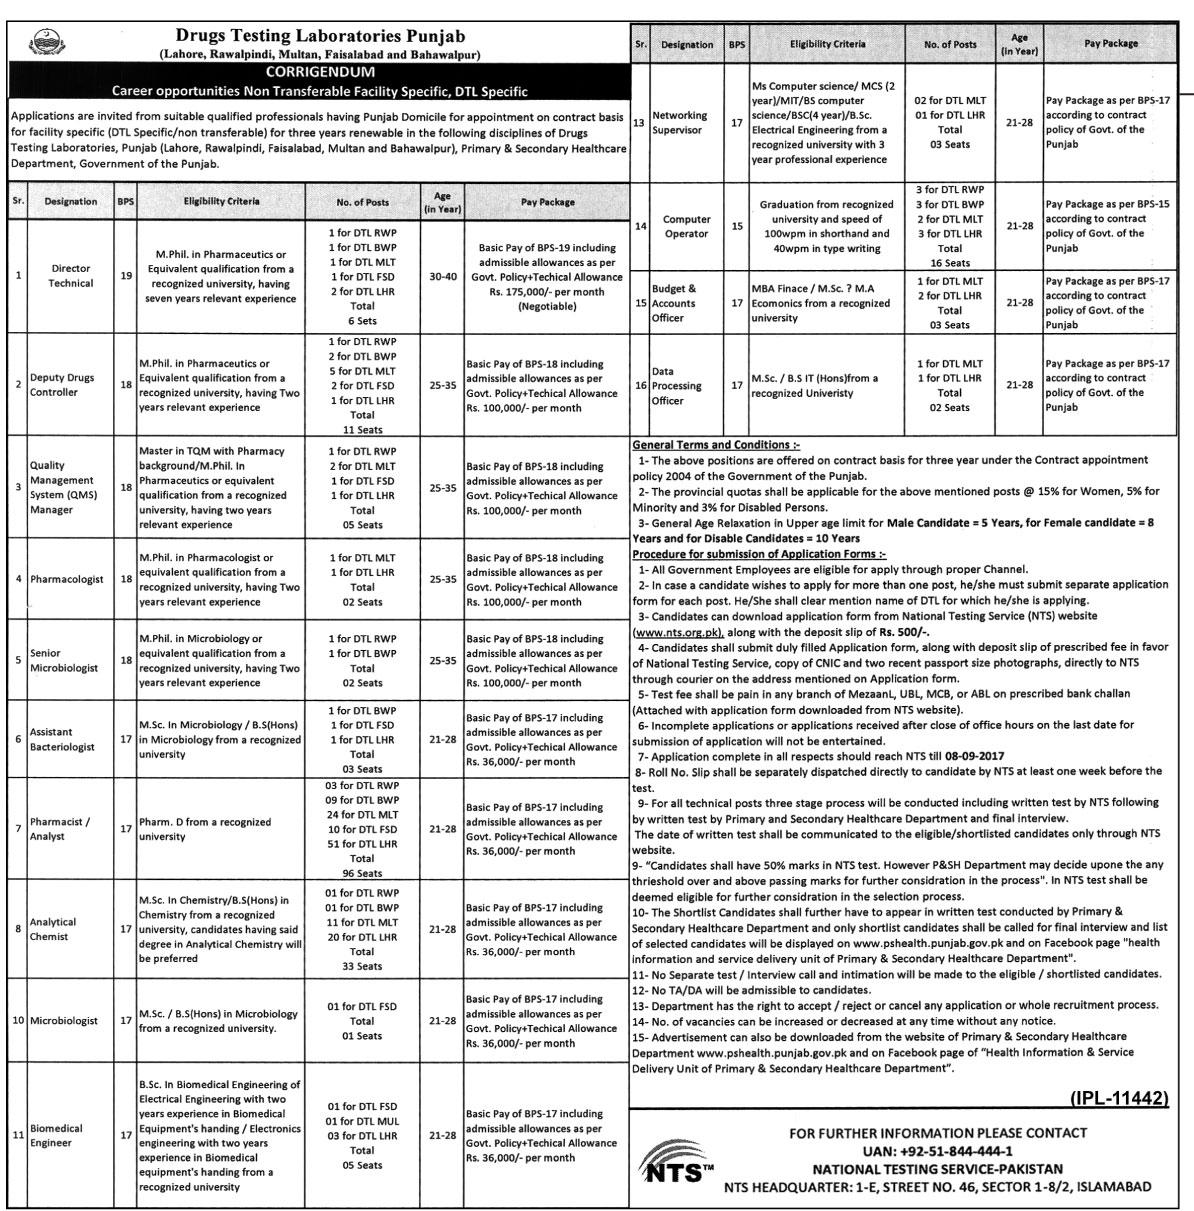 Drugs Testing Laboratories DTL Punjab Jobs 2017 NTS Test Answer Key & Result